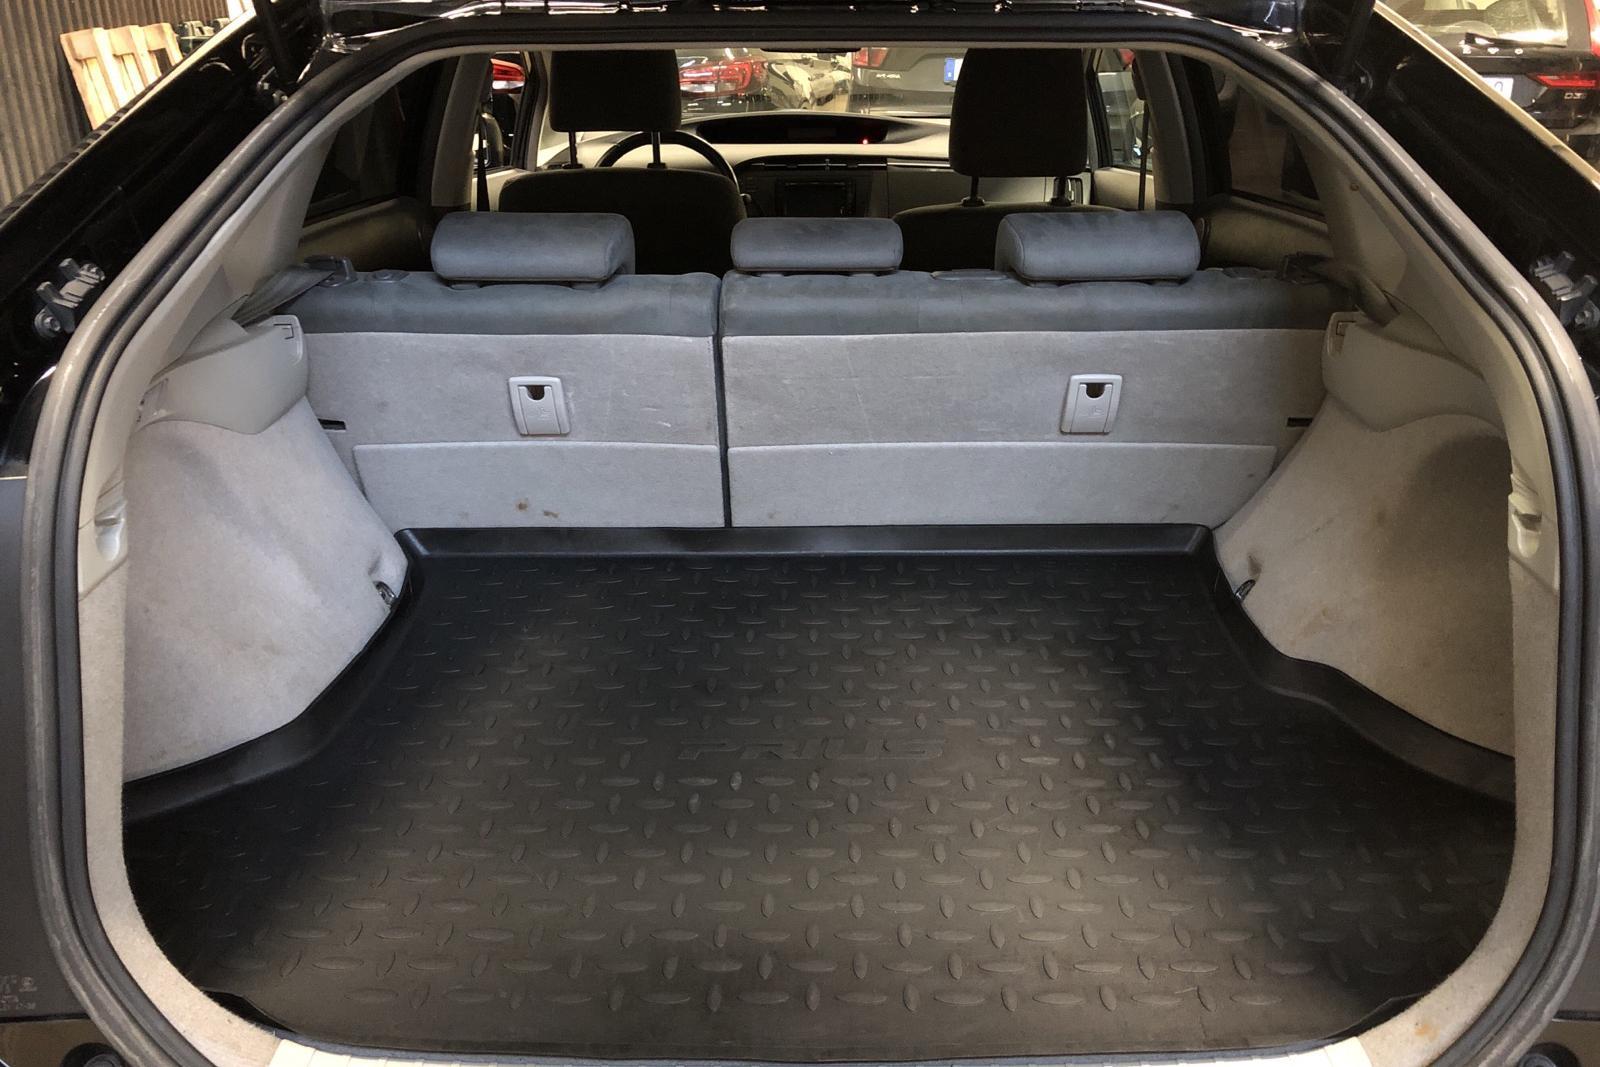 Toyota Prius 1.8 Hybrid (99hk) - 183 000 km - Automatic - black - 2011